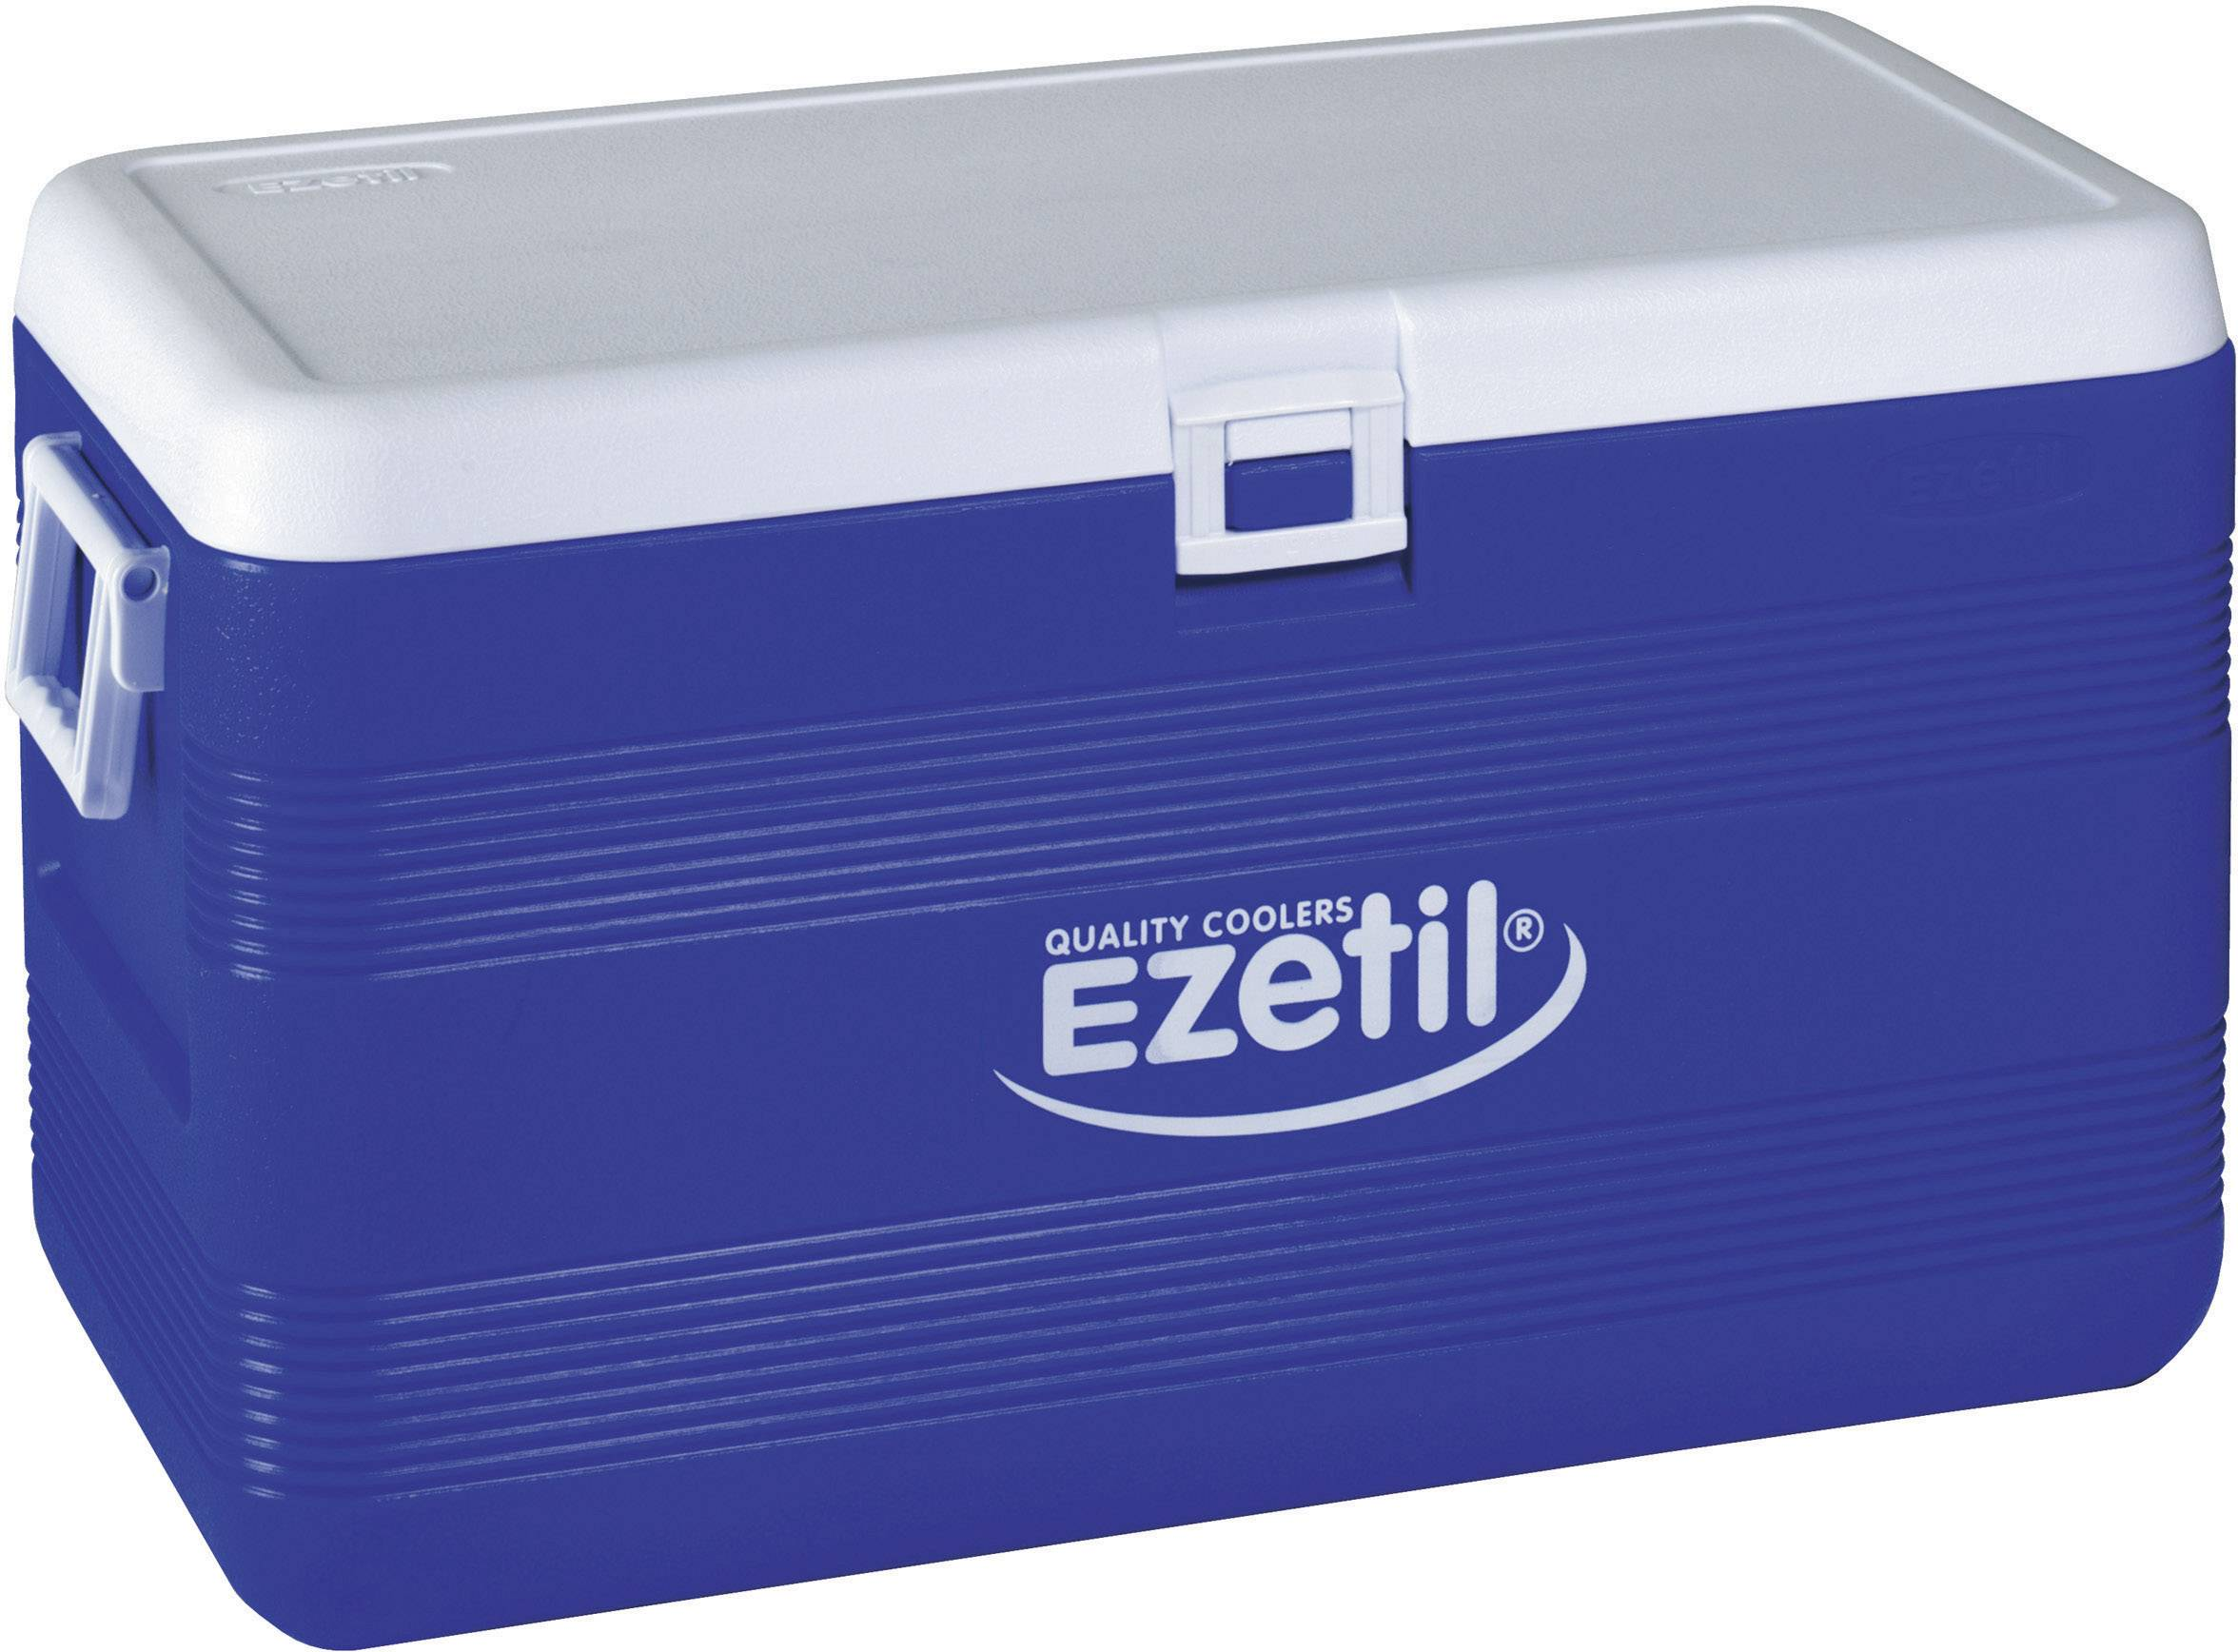 Prenosná chladnička (autochladnička) Ezetil XXL 3-DAYS ICE EZ 70, 70 l, modrá, biela, sivá